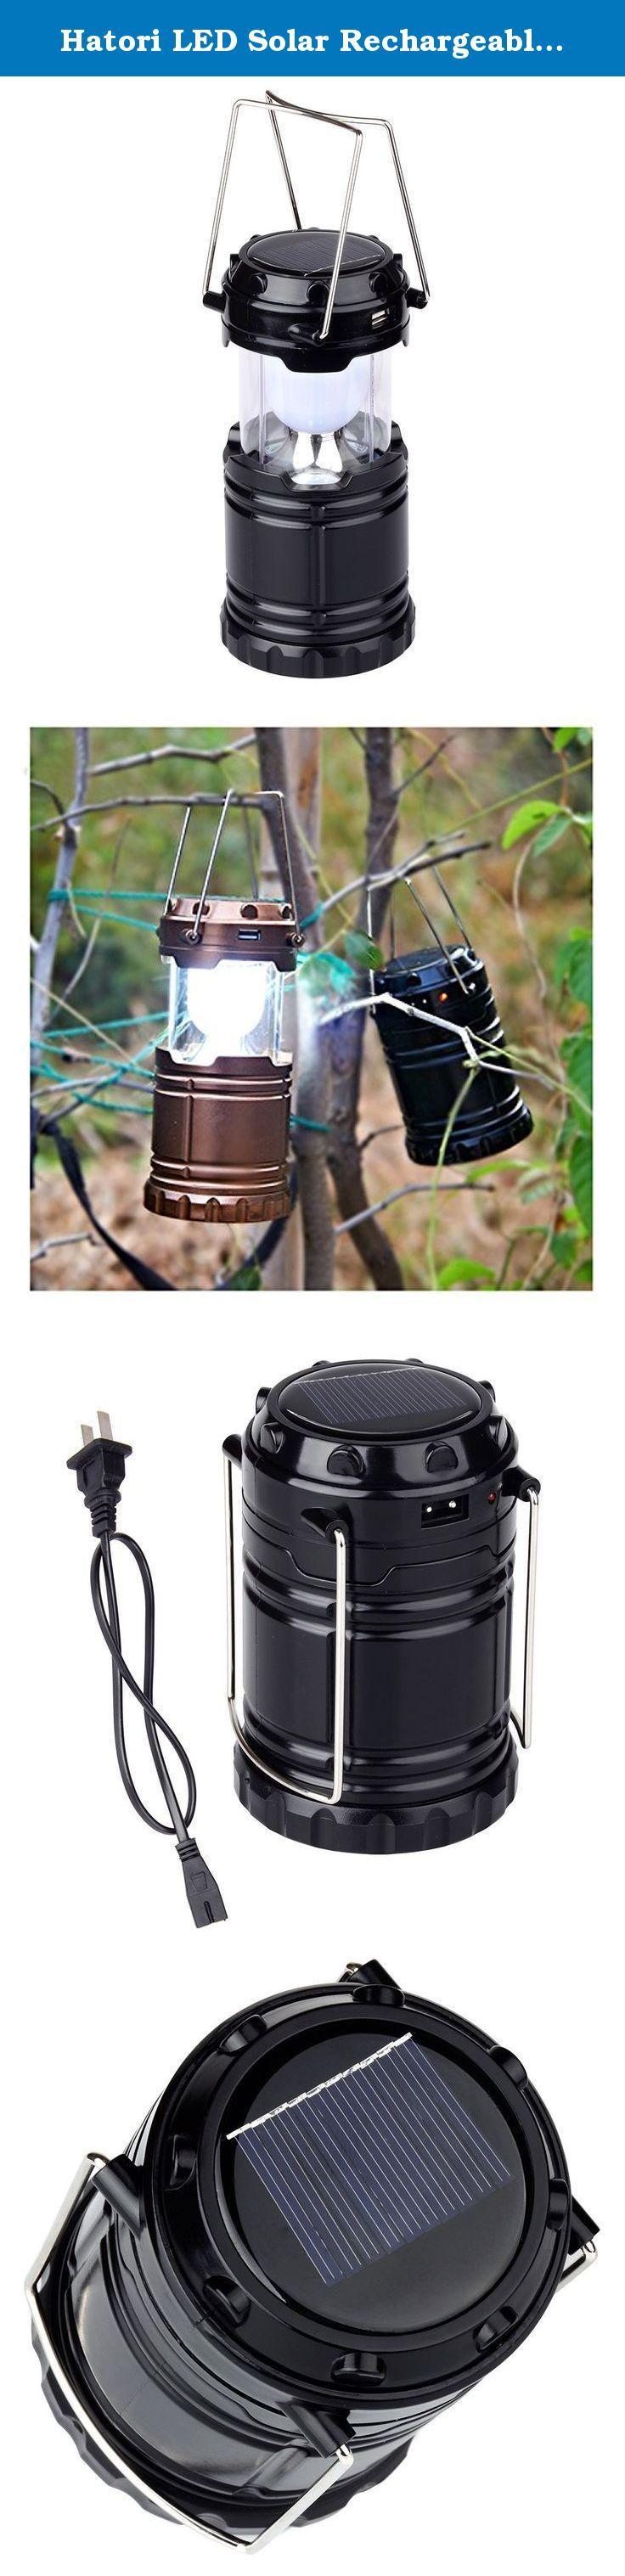 Hatori LED Solar Rechargeable Camping Lantern, Emergency